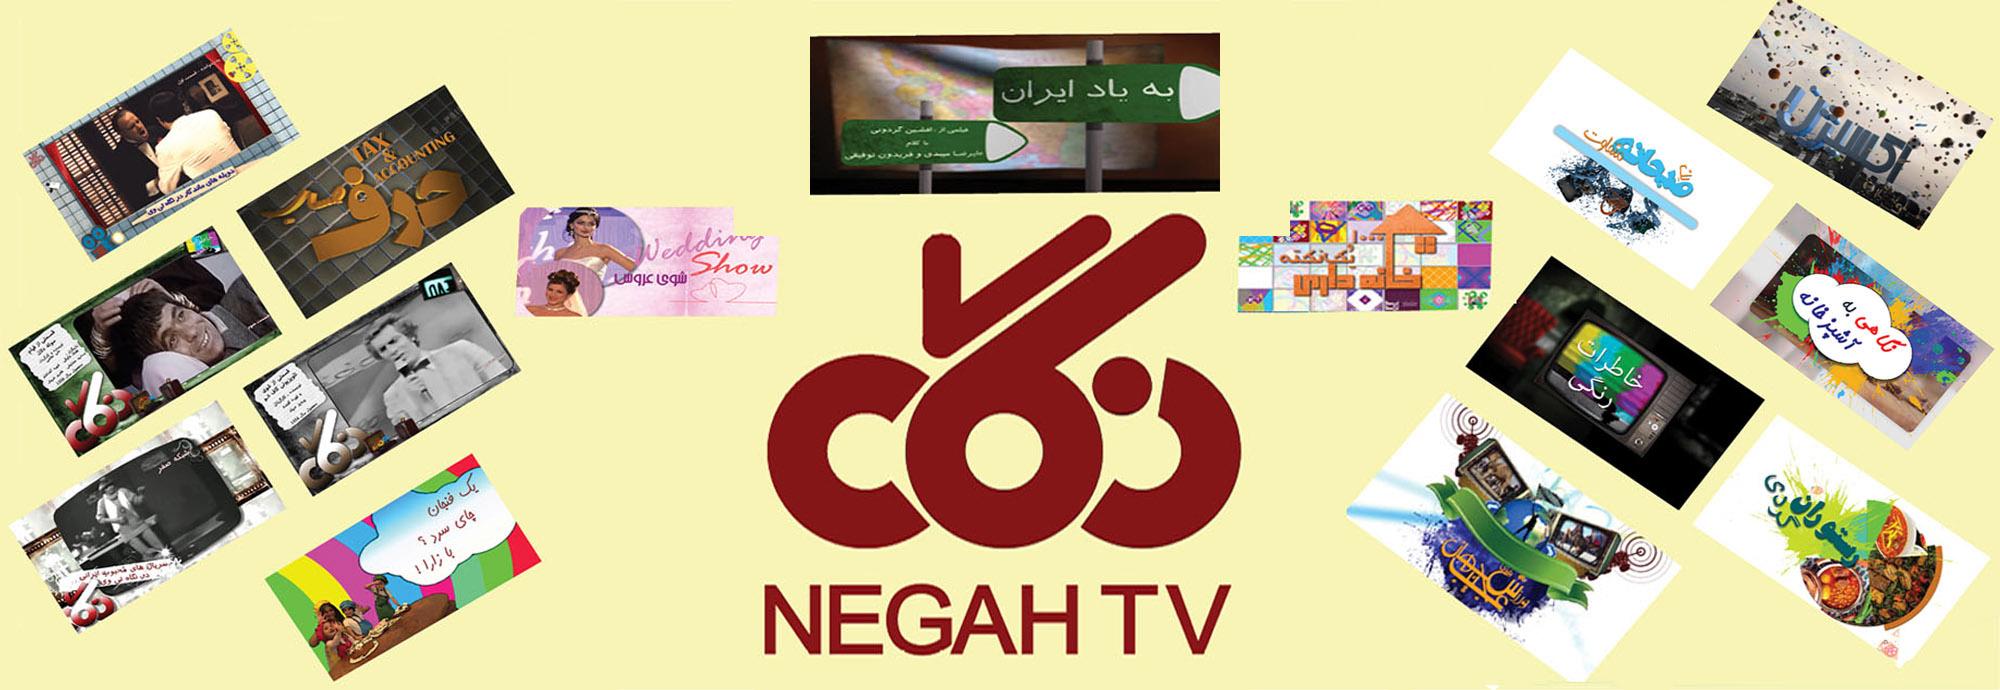 1-NEGAH TV f 2000x690